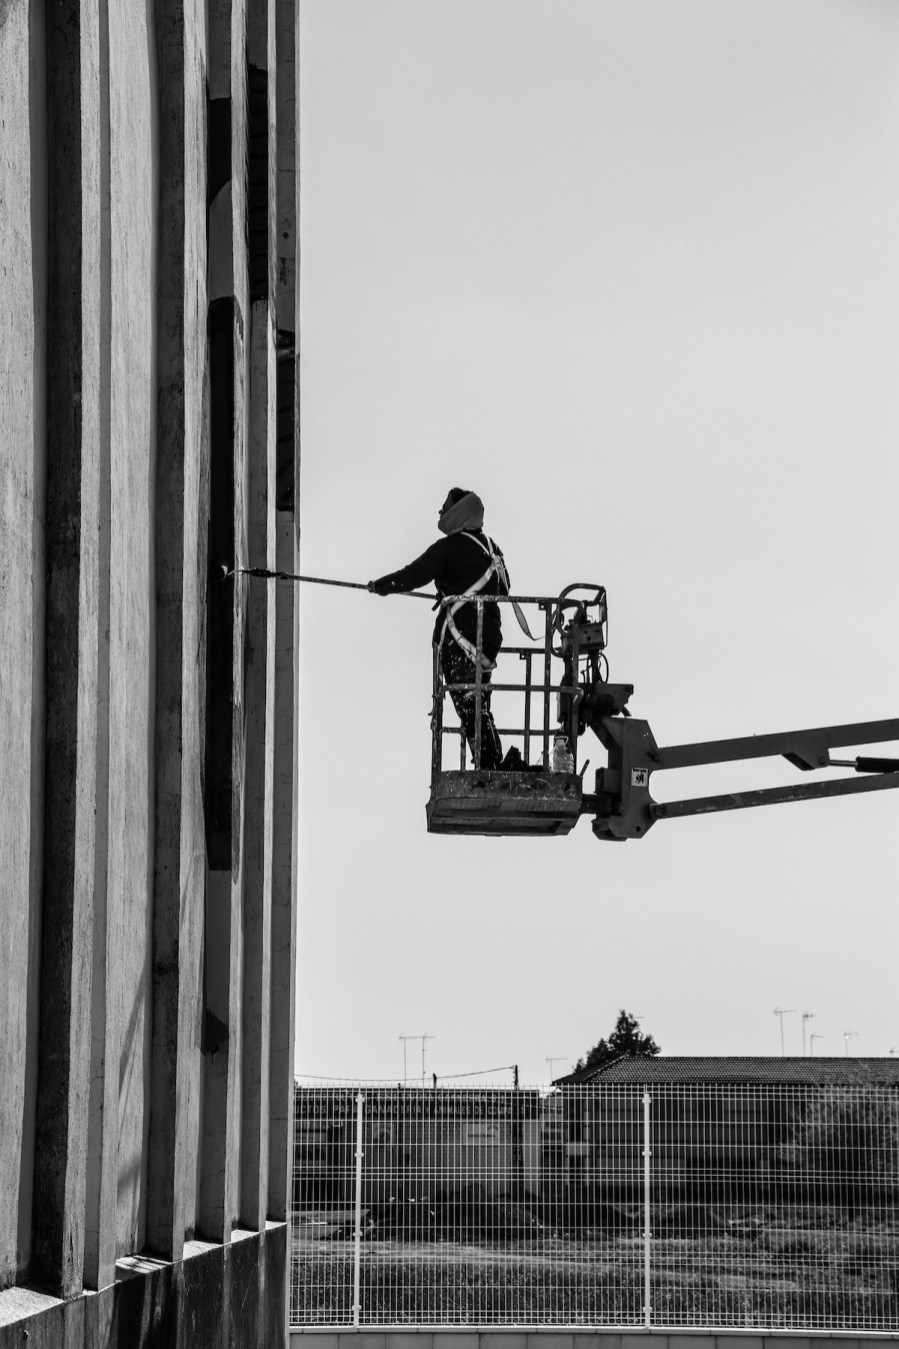 Daniel-Muñoz-titanes-street-art-silos-Ciudad-Real-pc-ink-and-movement-1